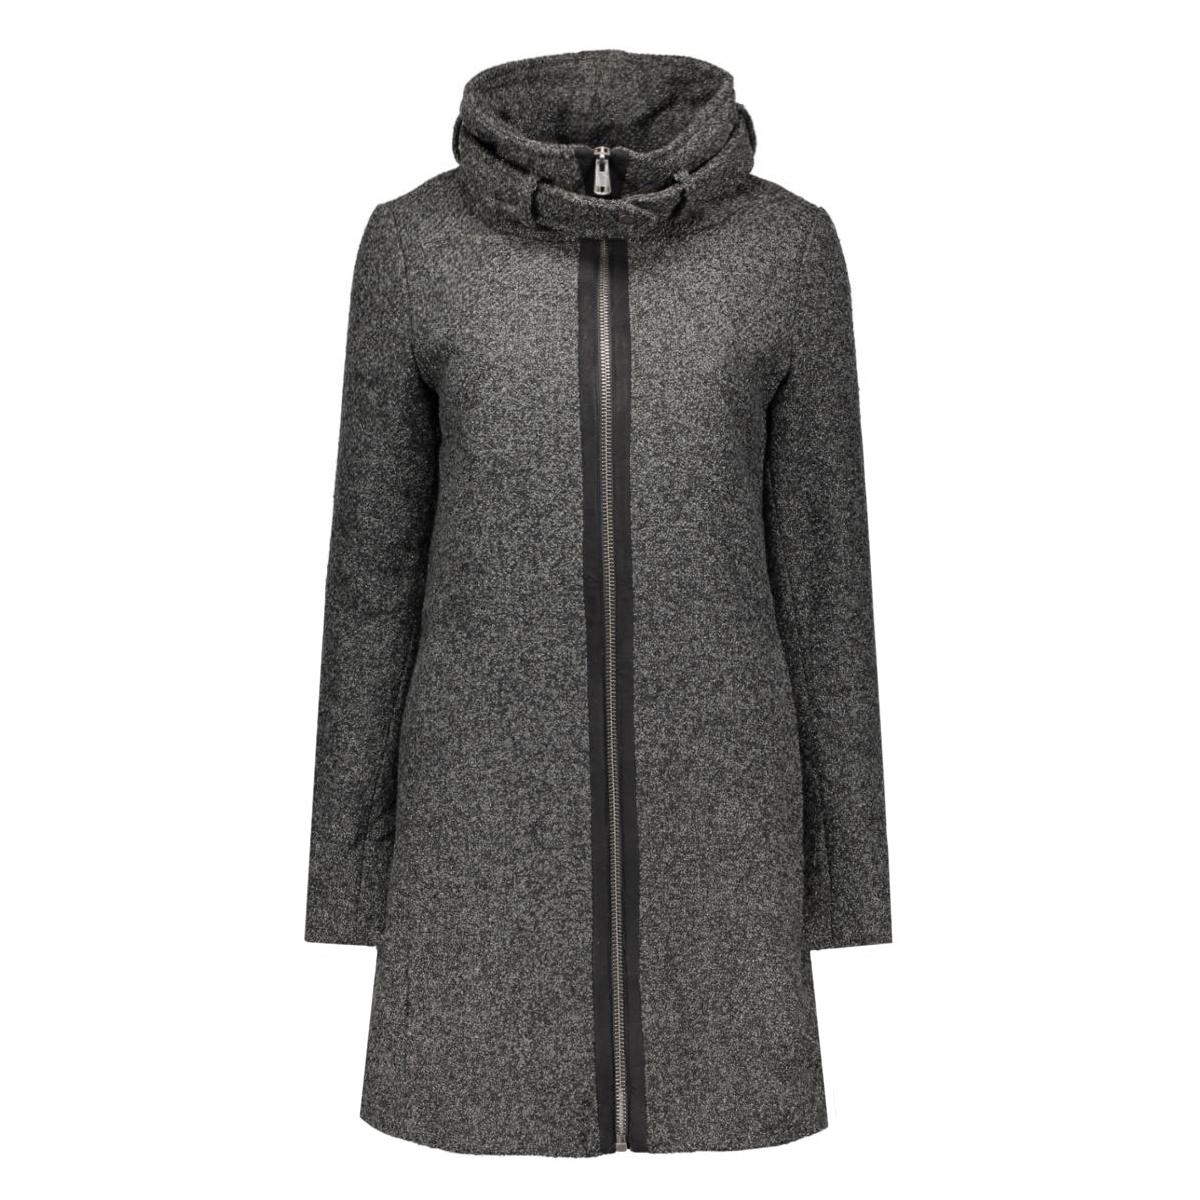 objnomi bella coat 86 23022689 object jas beluga